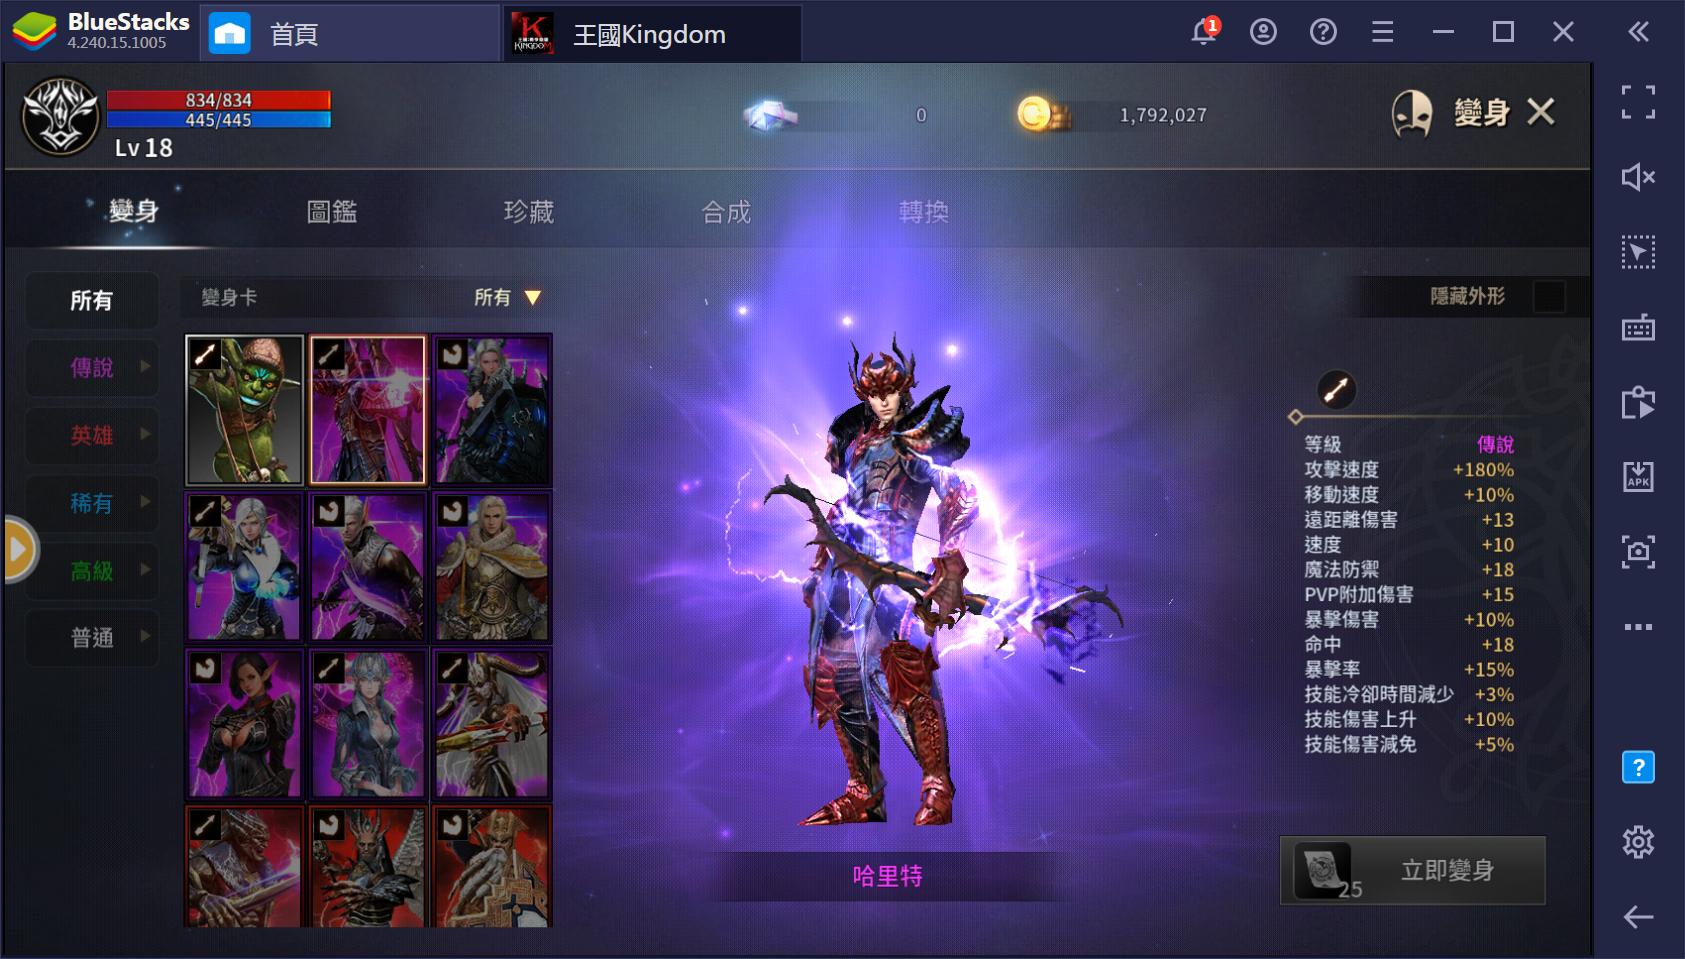 使用BlueStacks在PC上遊玩MMORPG手機遊戲 《王國Kingdom:戰爭餘燼》